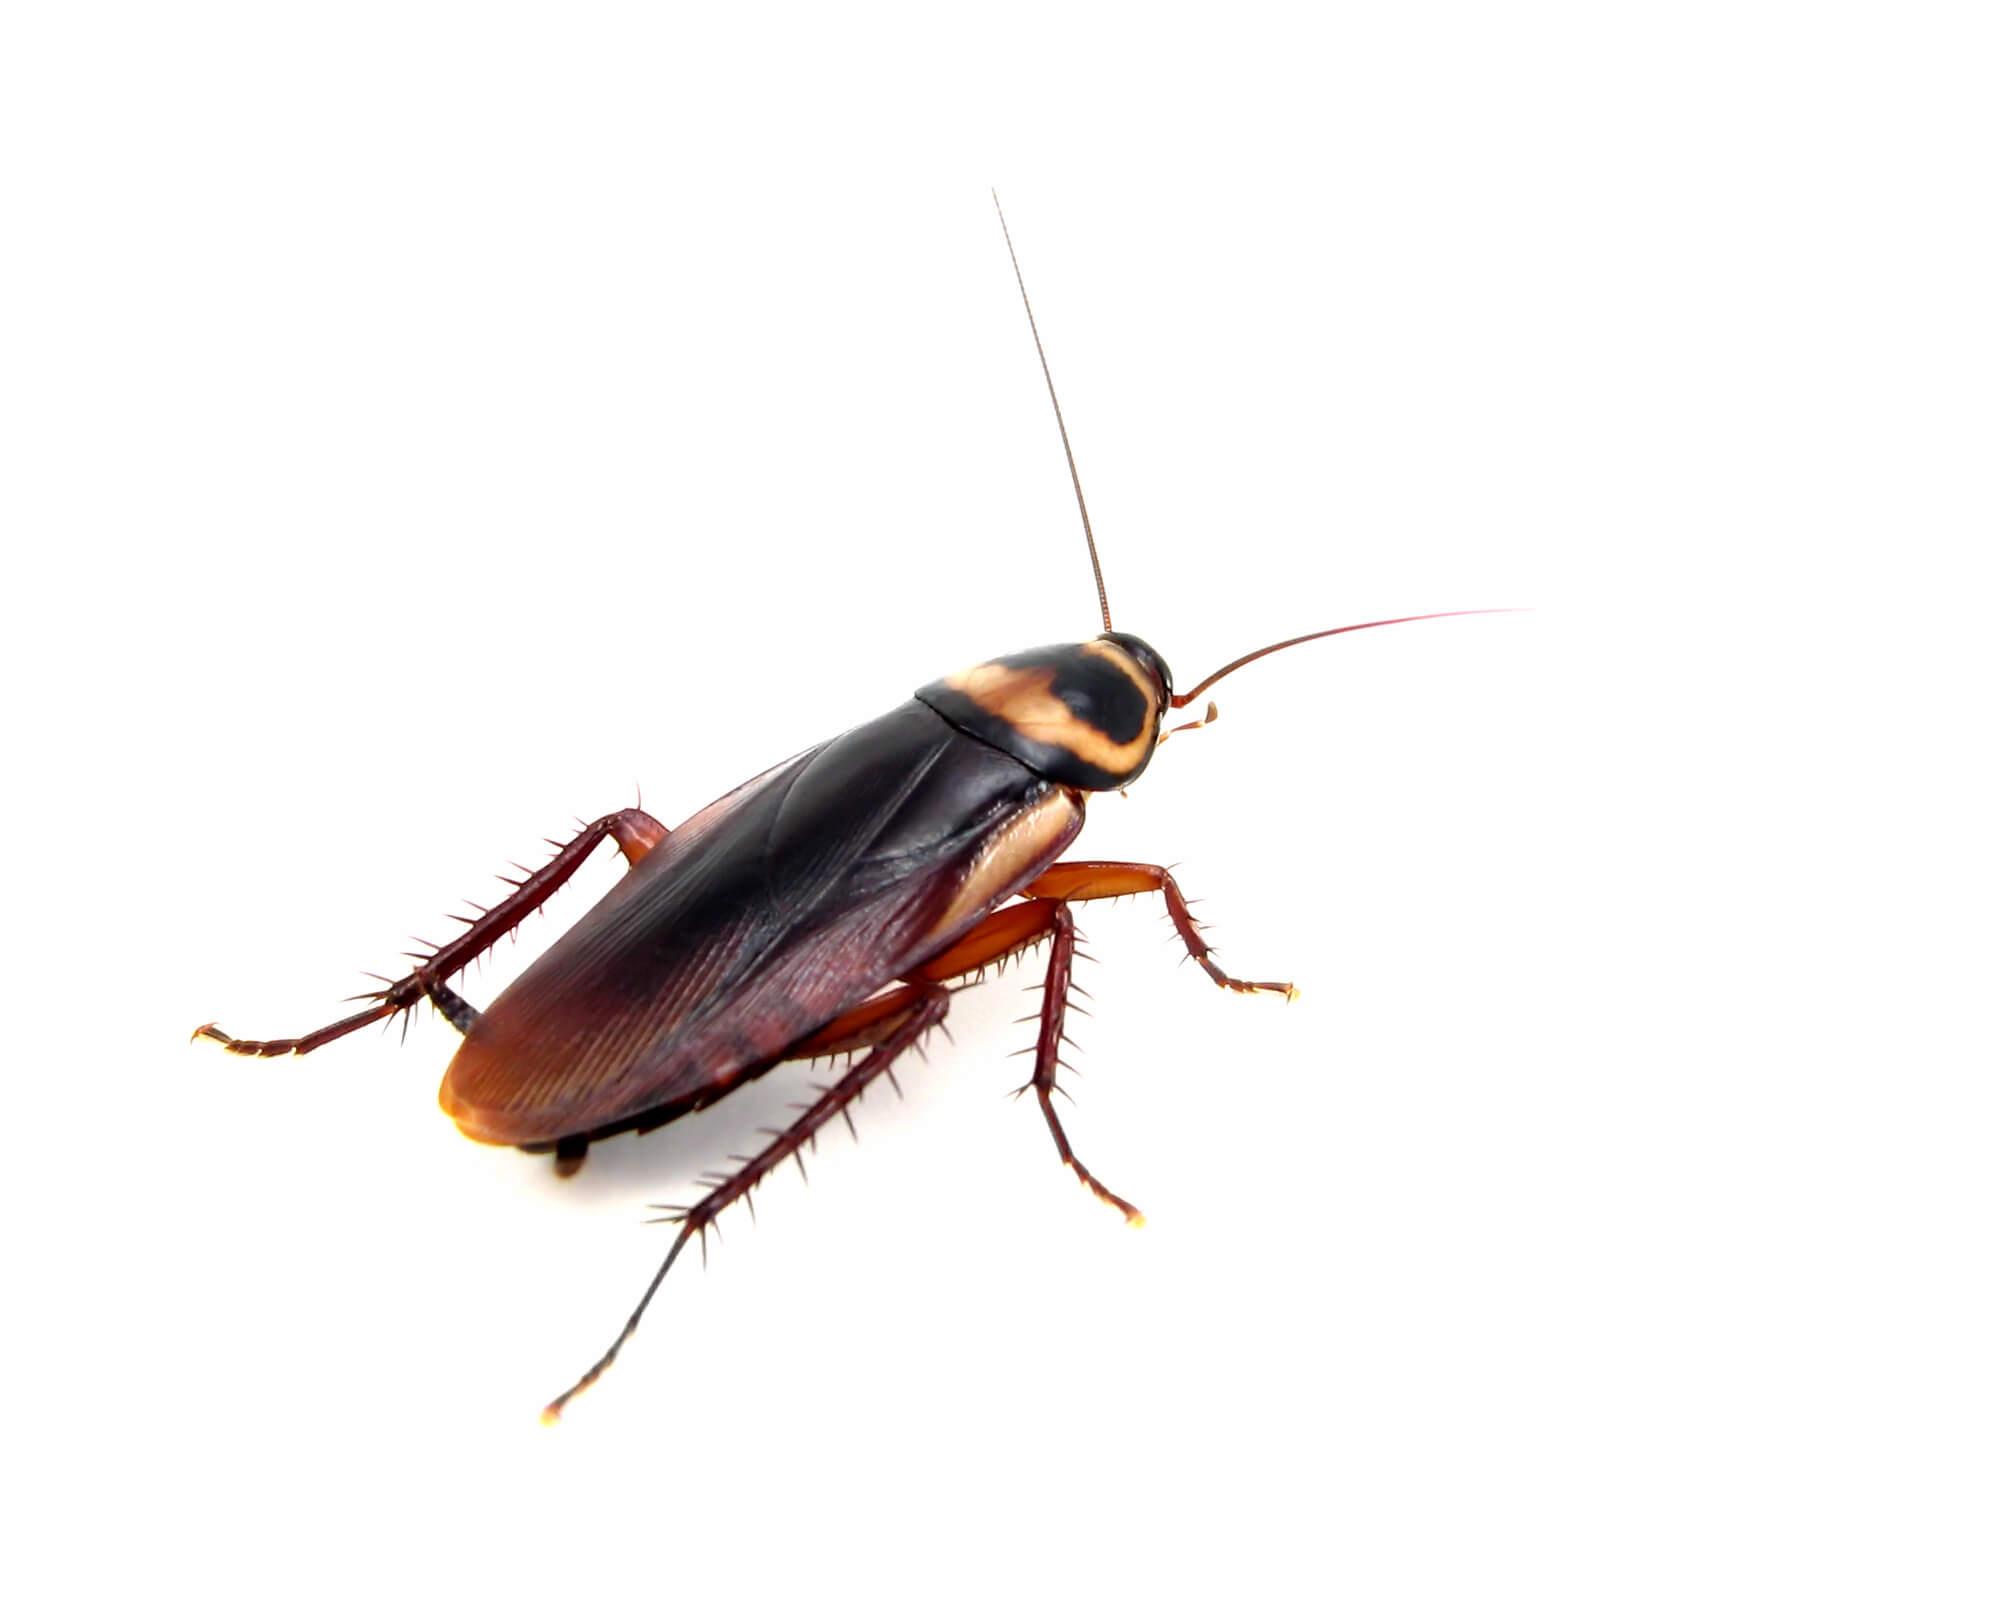 American Roach - 4